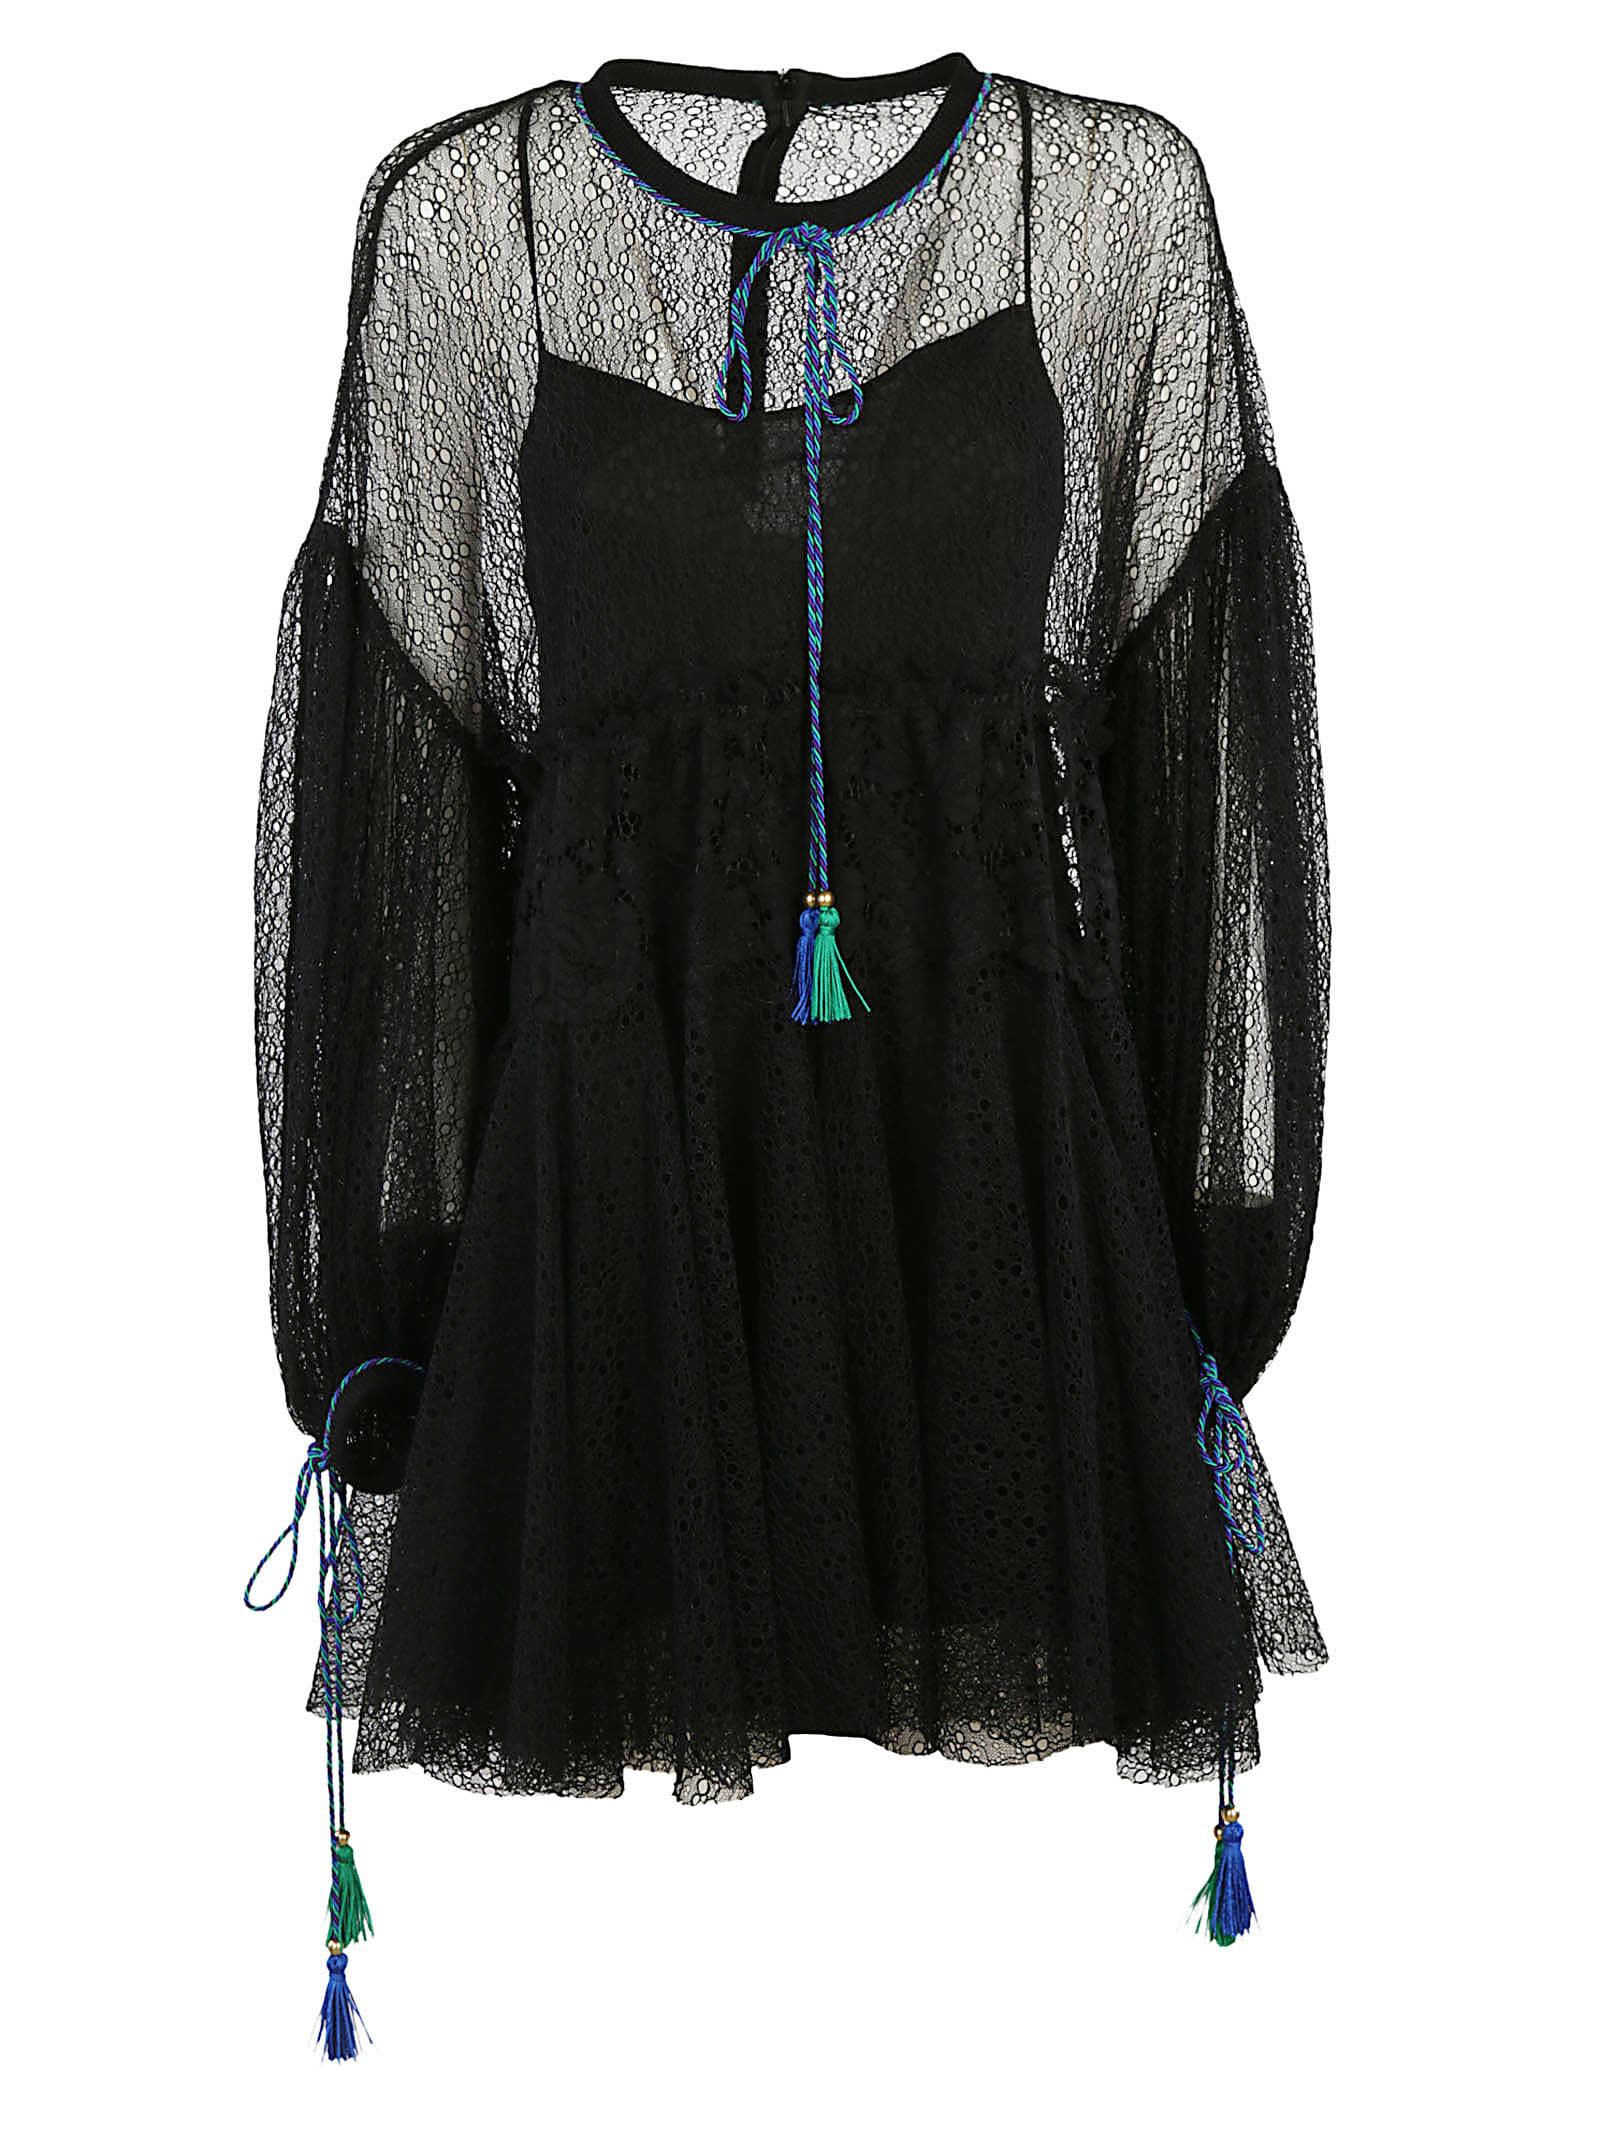 Philosophy di Lorenzo Serafini Tassel Lace Dress